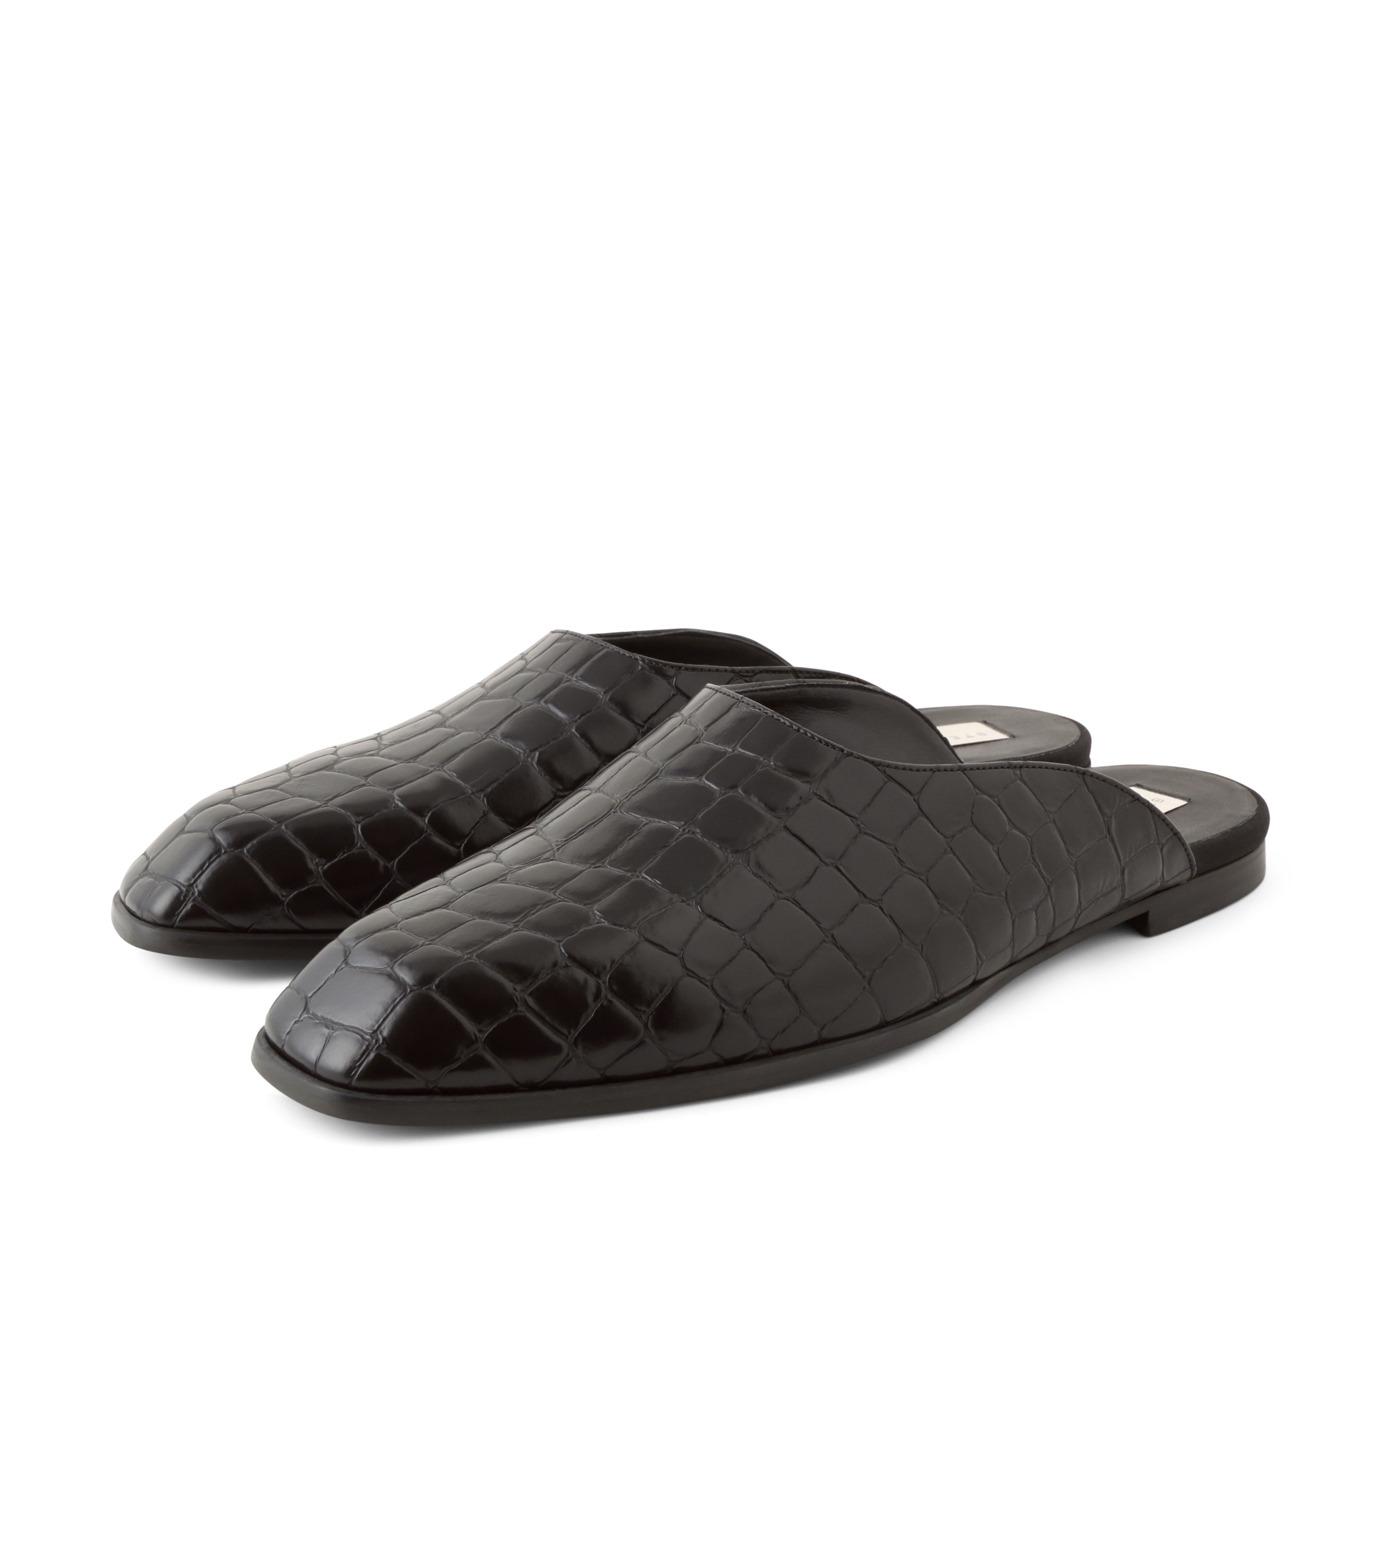 Stella McCartney(ステラマッカートニー)のCroco Moccasion-BLACK(フラットシューズ/Flat shoes)-430856-W0ZY0-13 拡大詳細画像3